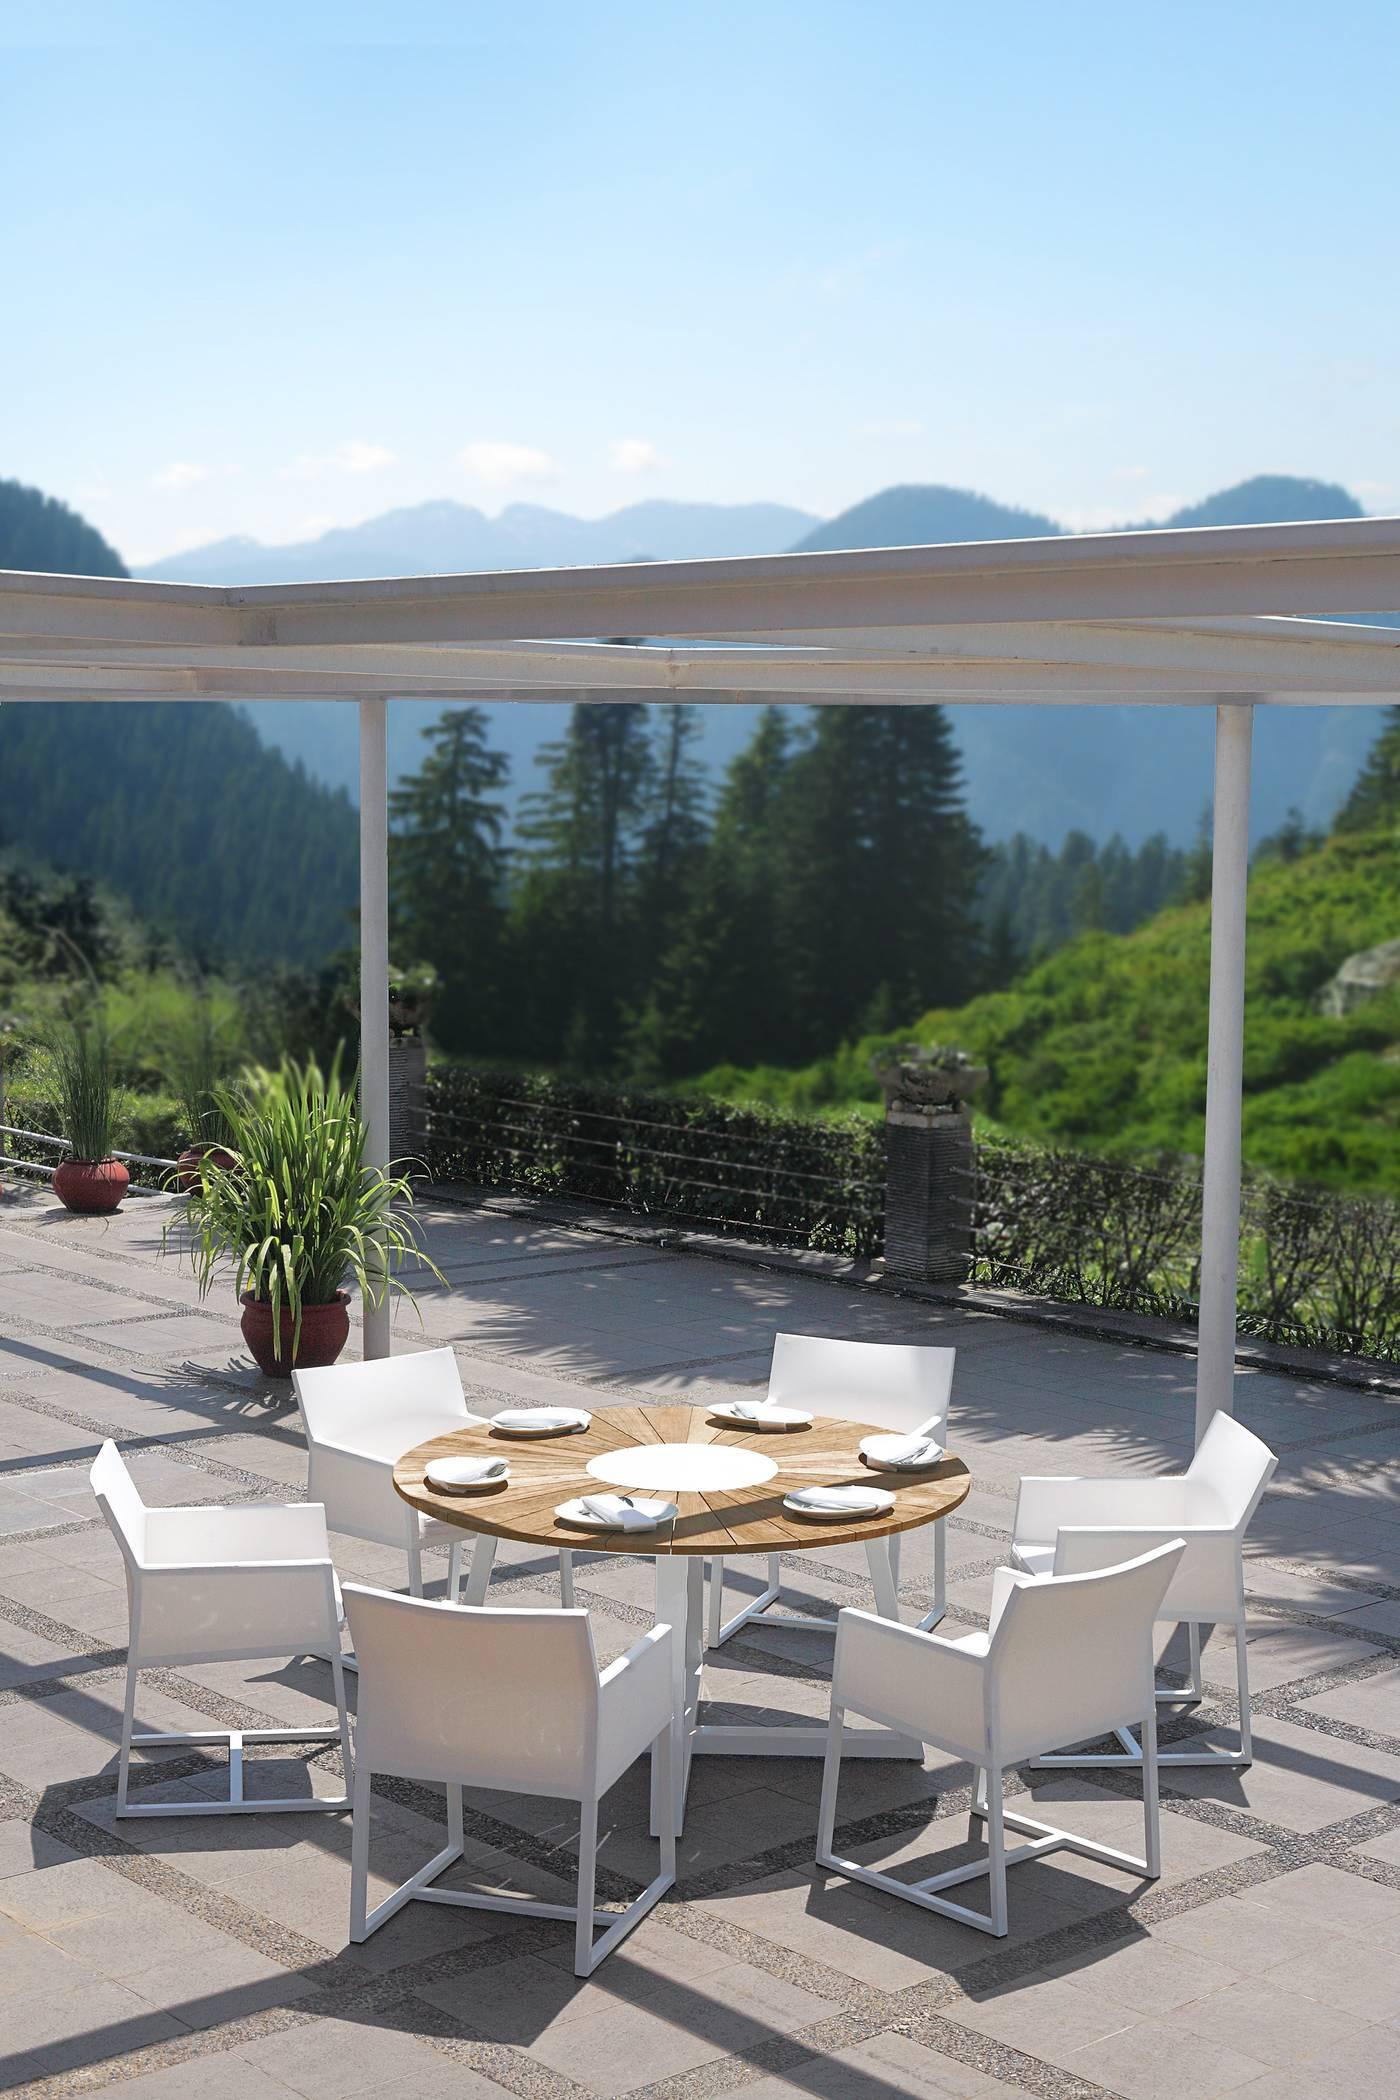 Baia Round Dining Table 150 cm - Teak